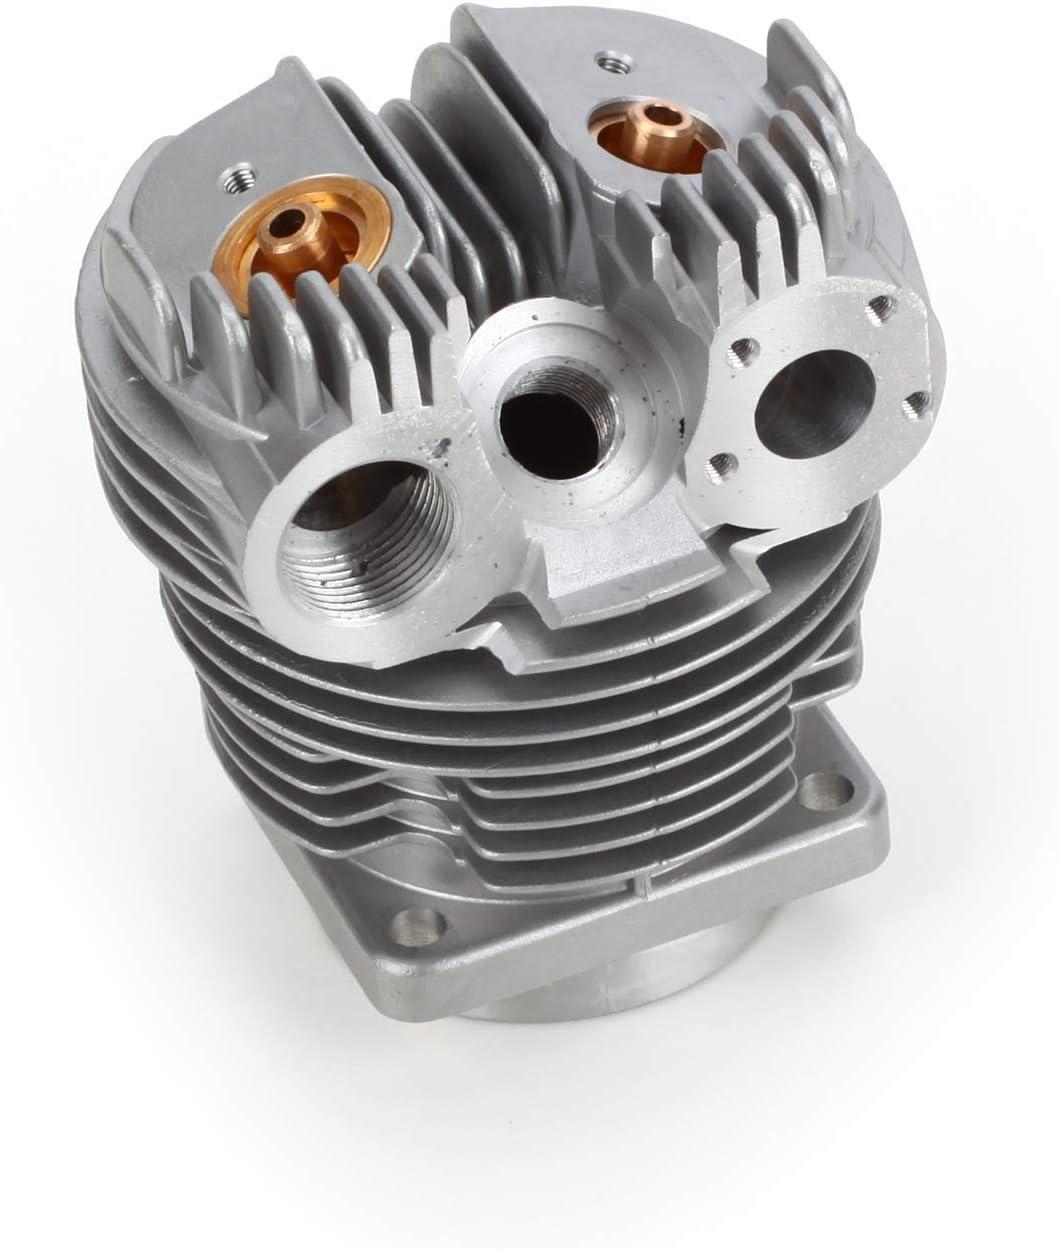 Max 88% OFF Saito Popular shop is the lowest price challenge Engines Cylinder SAIG57T01 Left :BG